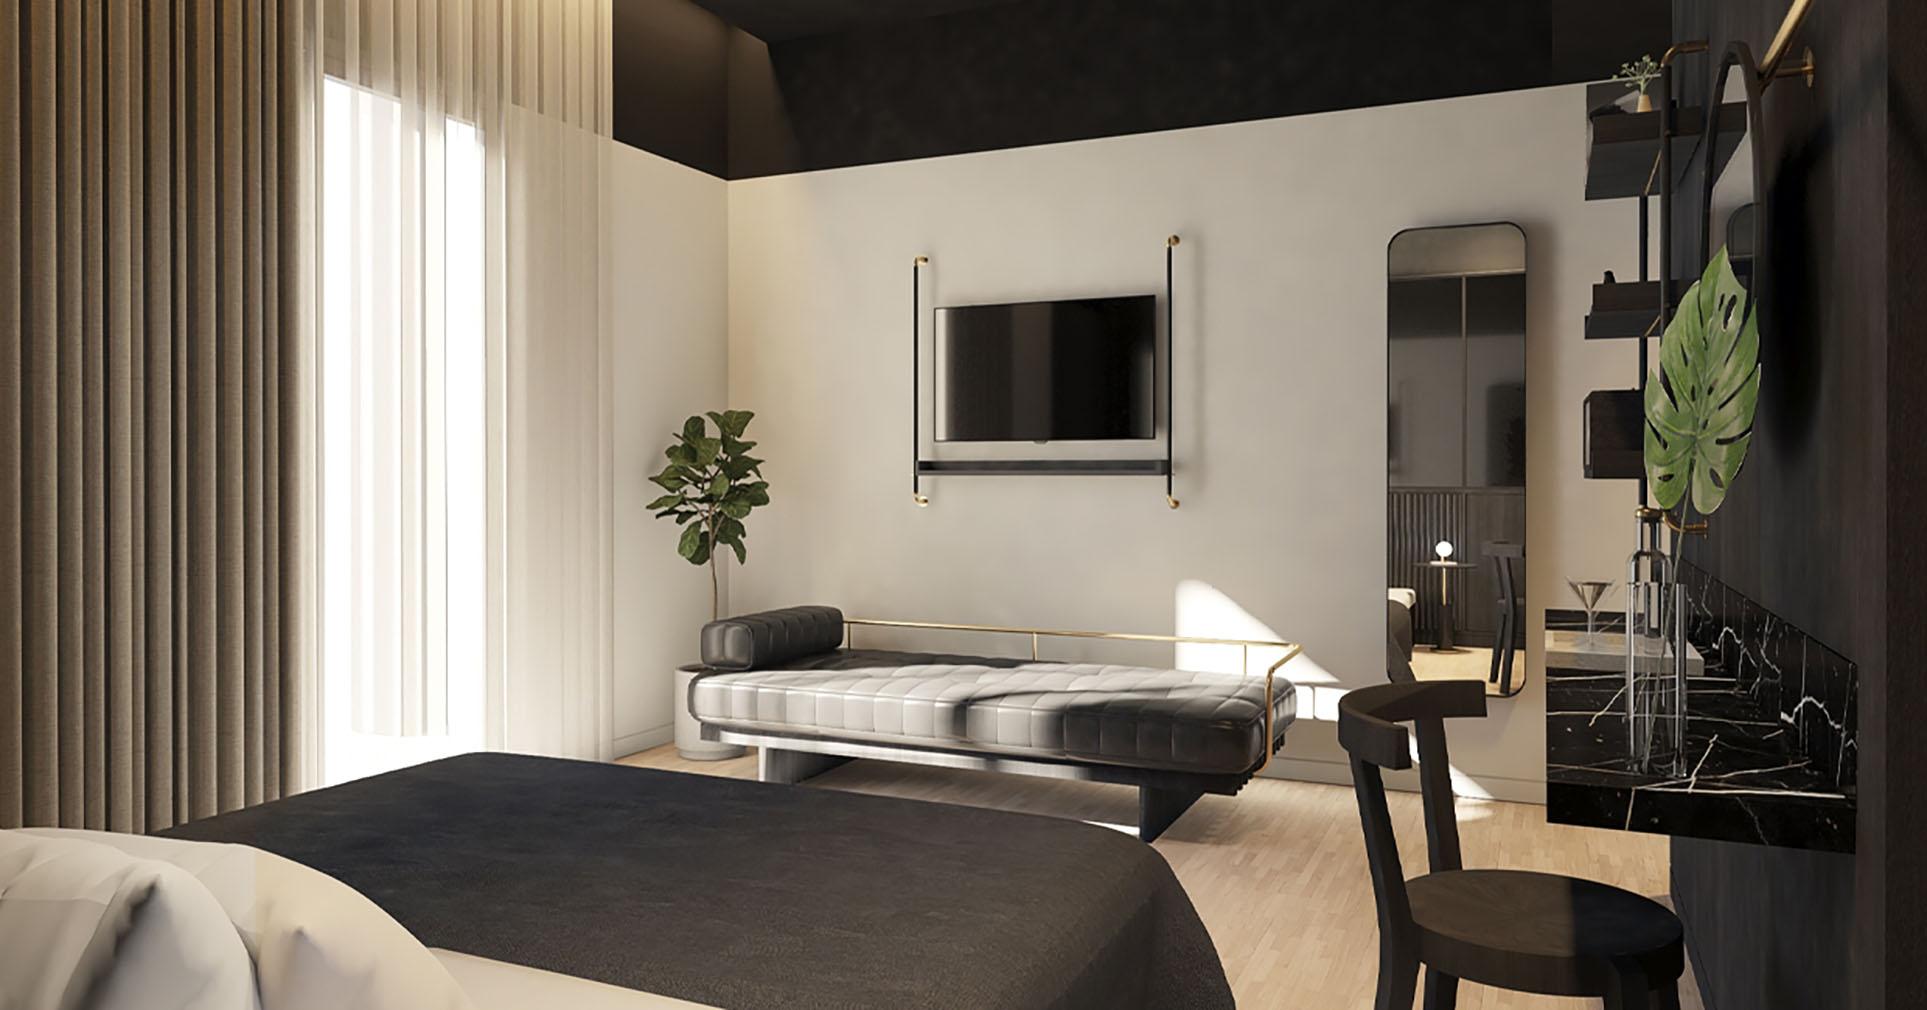 A bedroom suite inside The Modernist, Athens